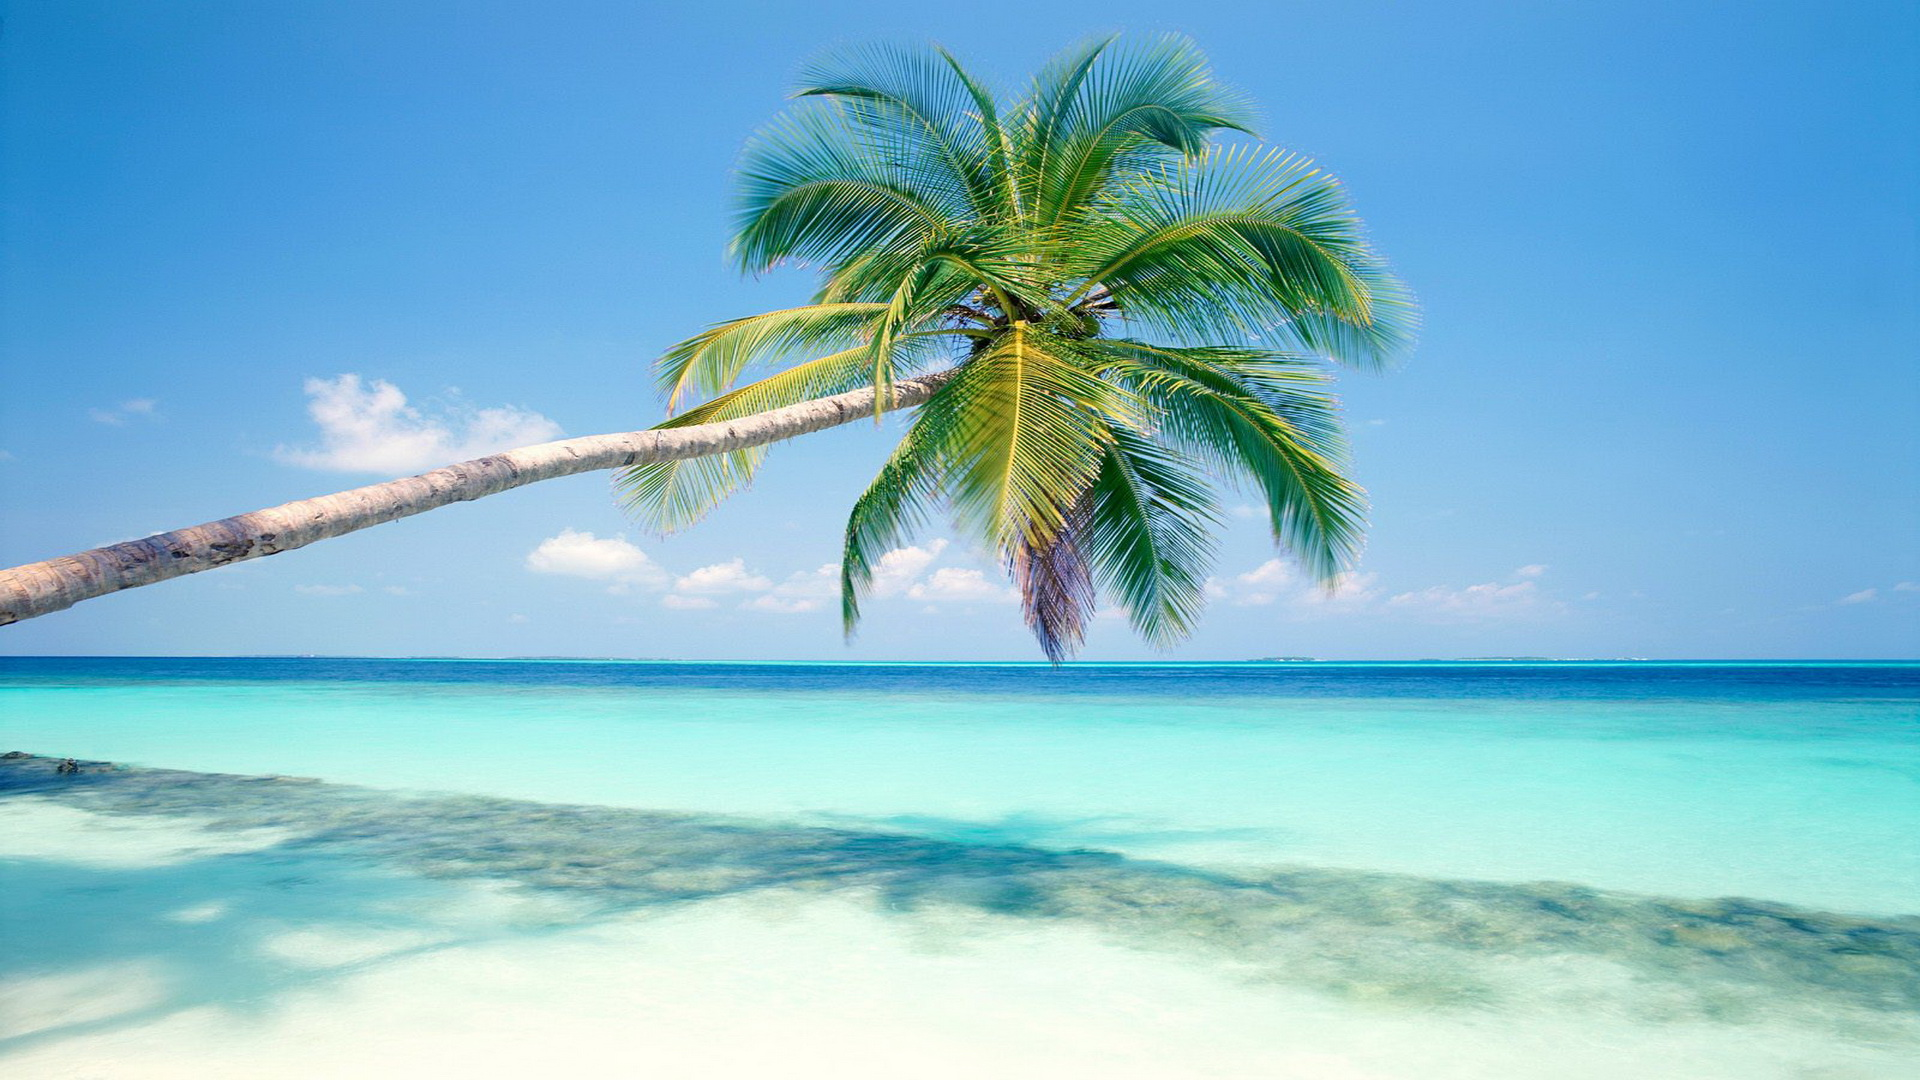 Pin Tropical Island Landscape 1920x1080 1920x1080